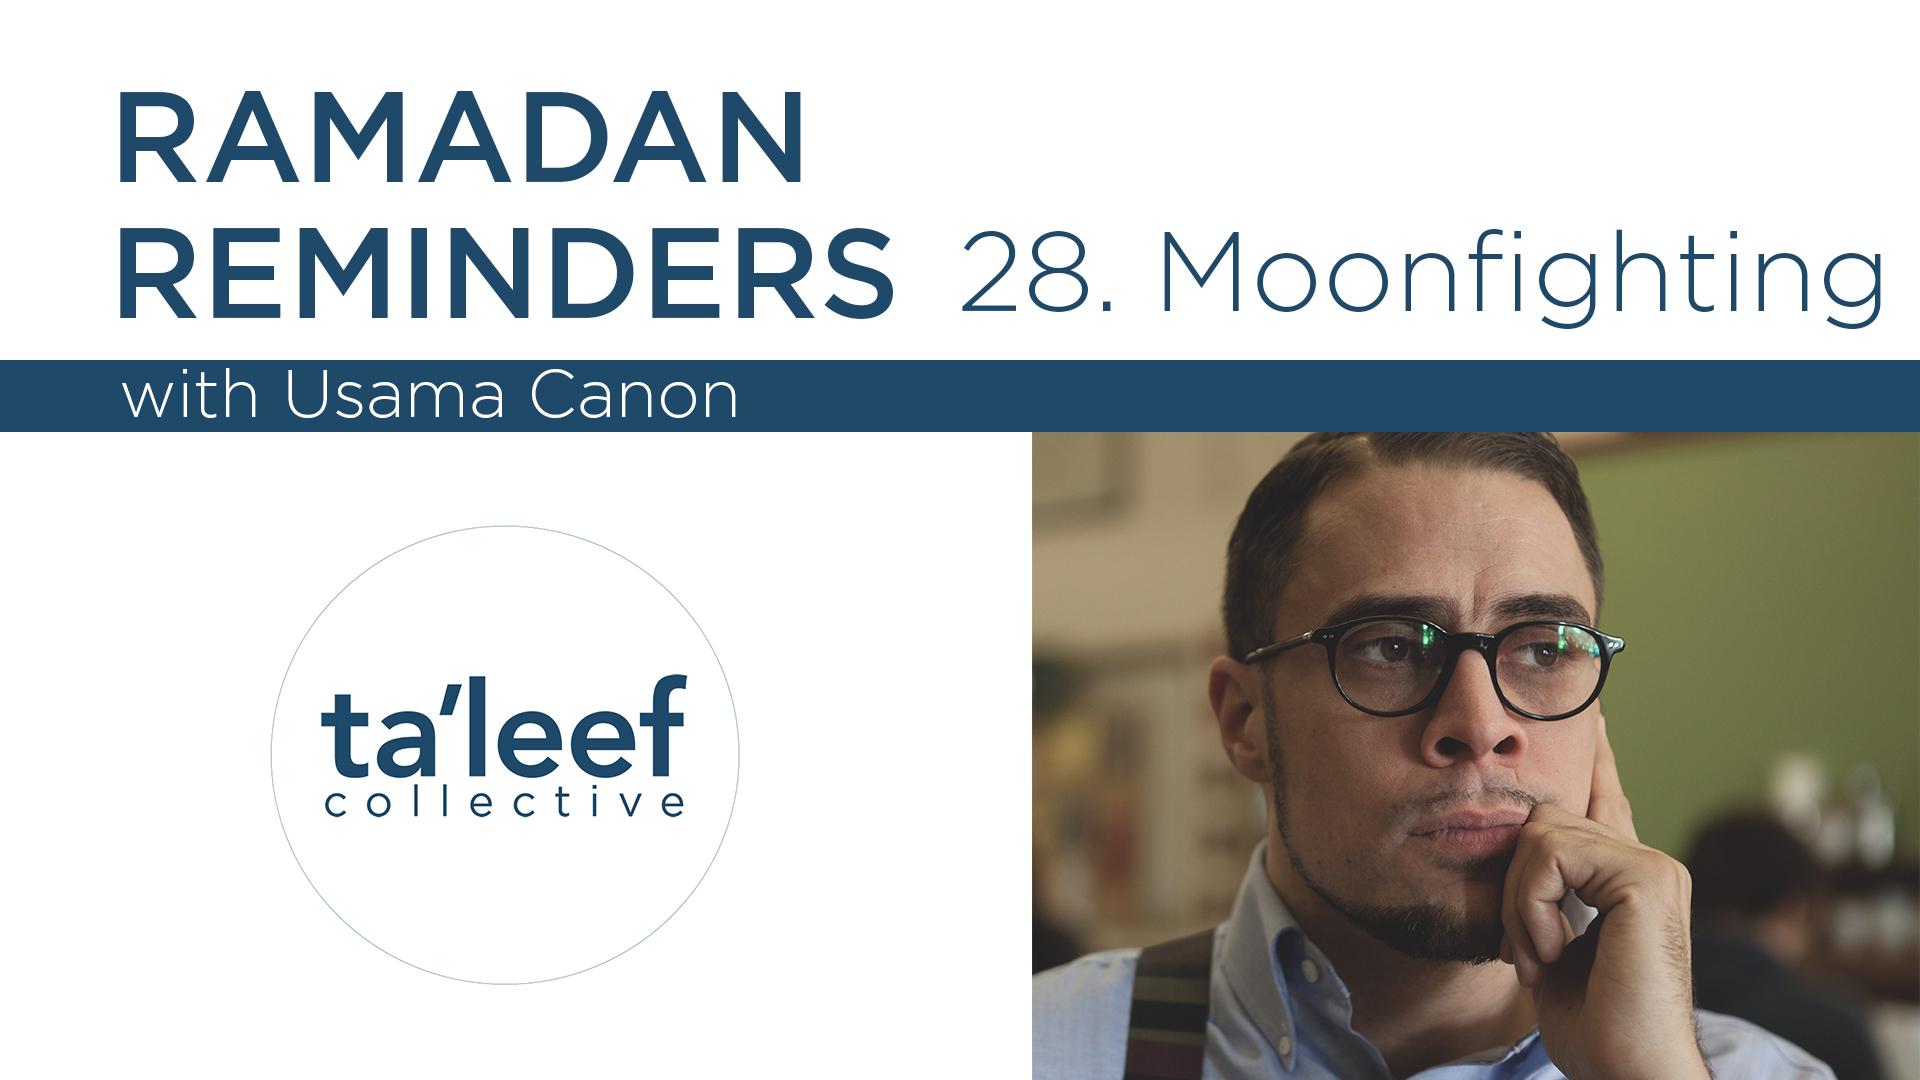 Ramadan-Reminders-28.jpg